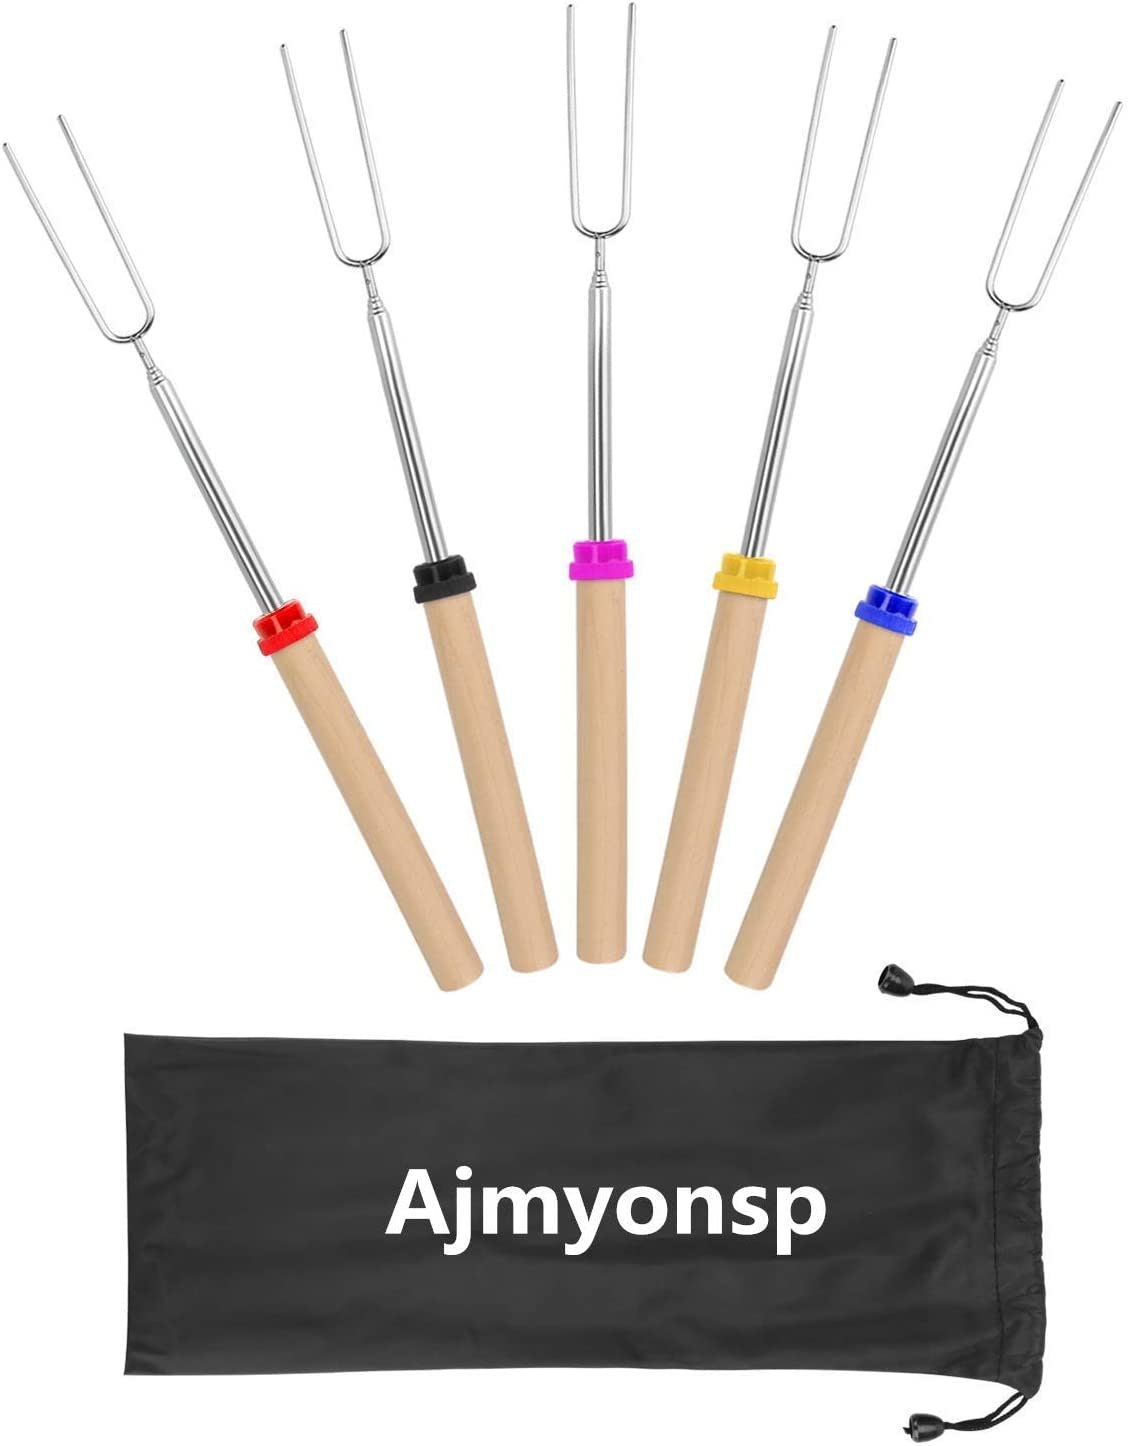 Ajmyonsp Marshmallow Roasting Sticks